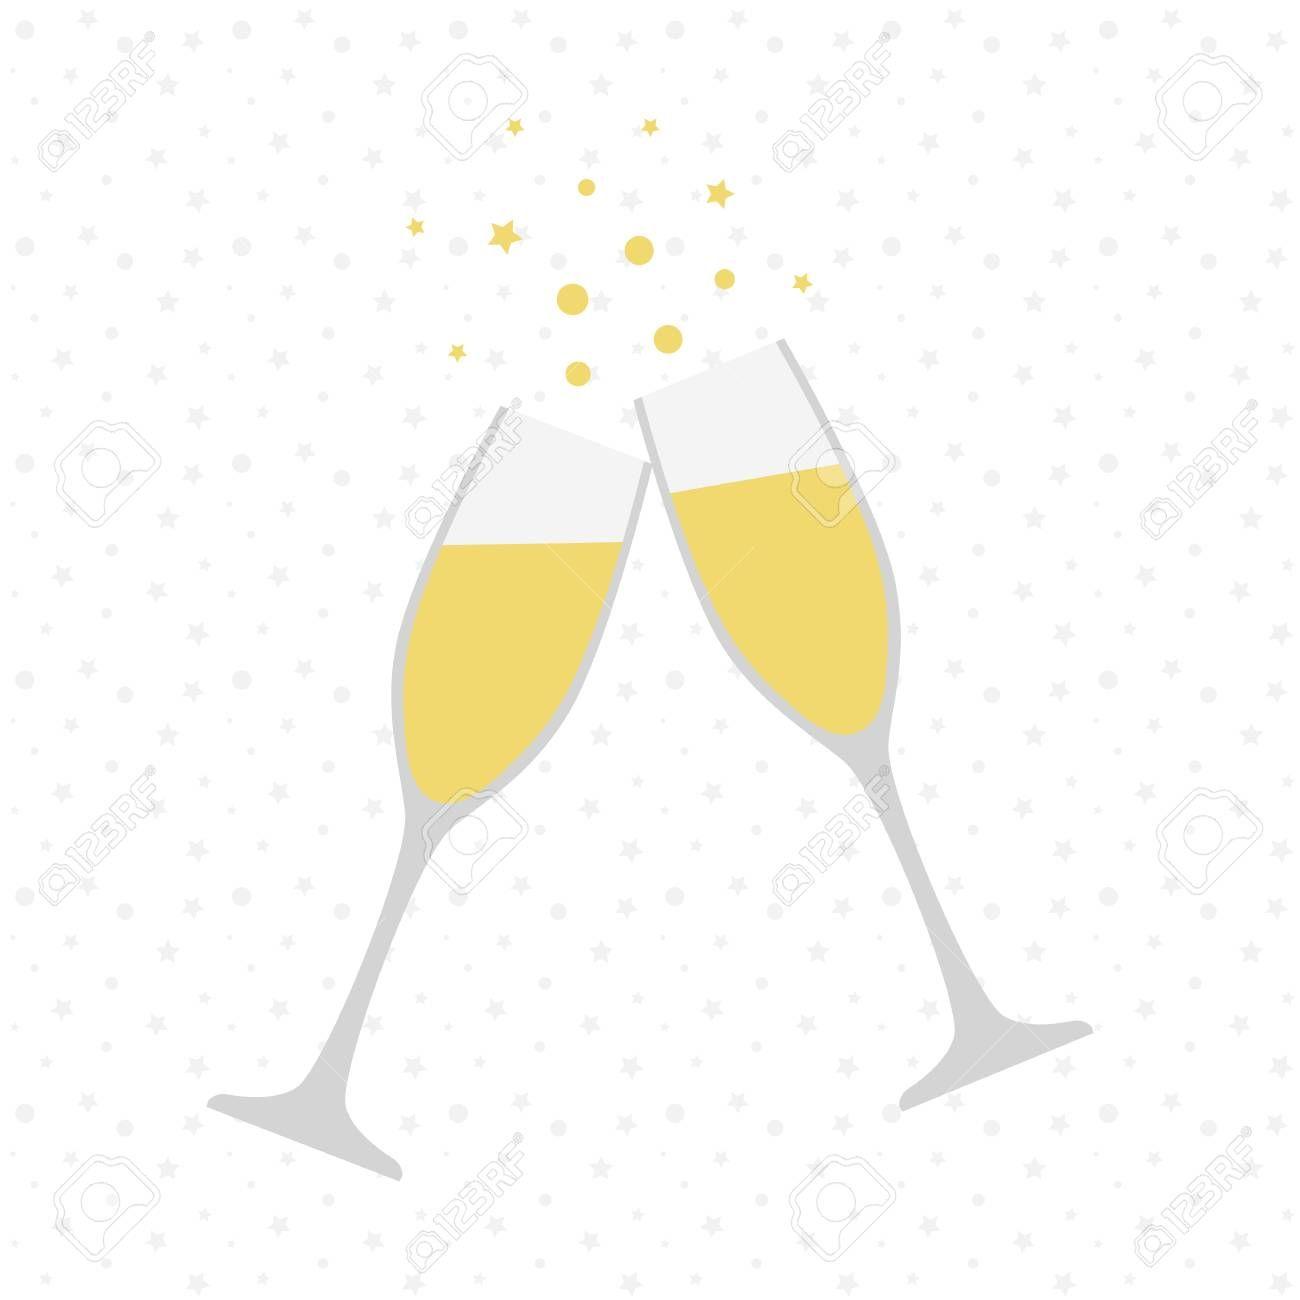 Two Champagne Glasses Cheers Celebration Holiday Toast Vector Illustration Illustration Sponsored Cheers Celebrati Sektglaser Hochzeit Feiertag Feier